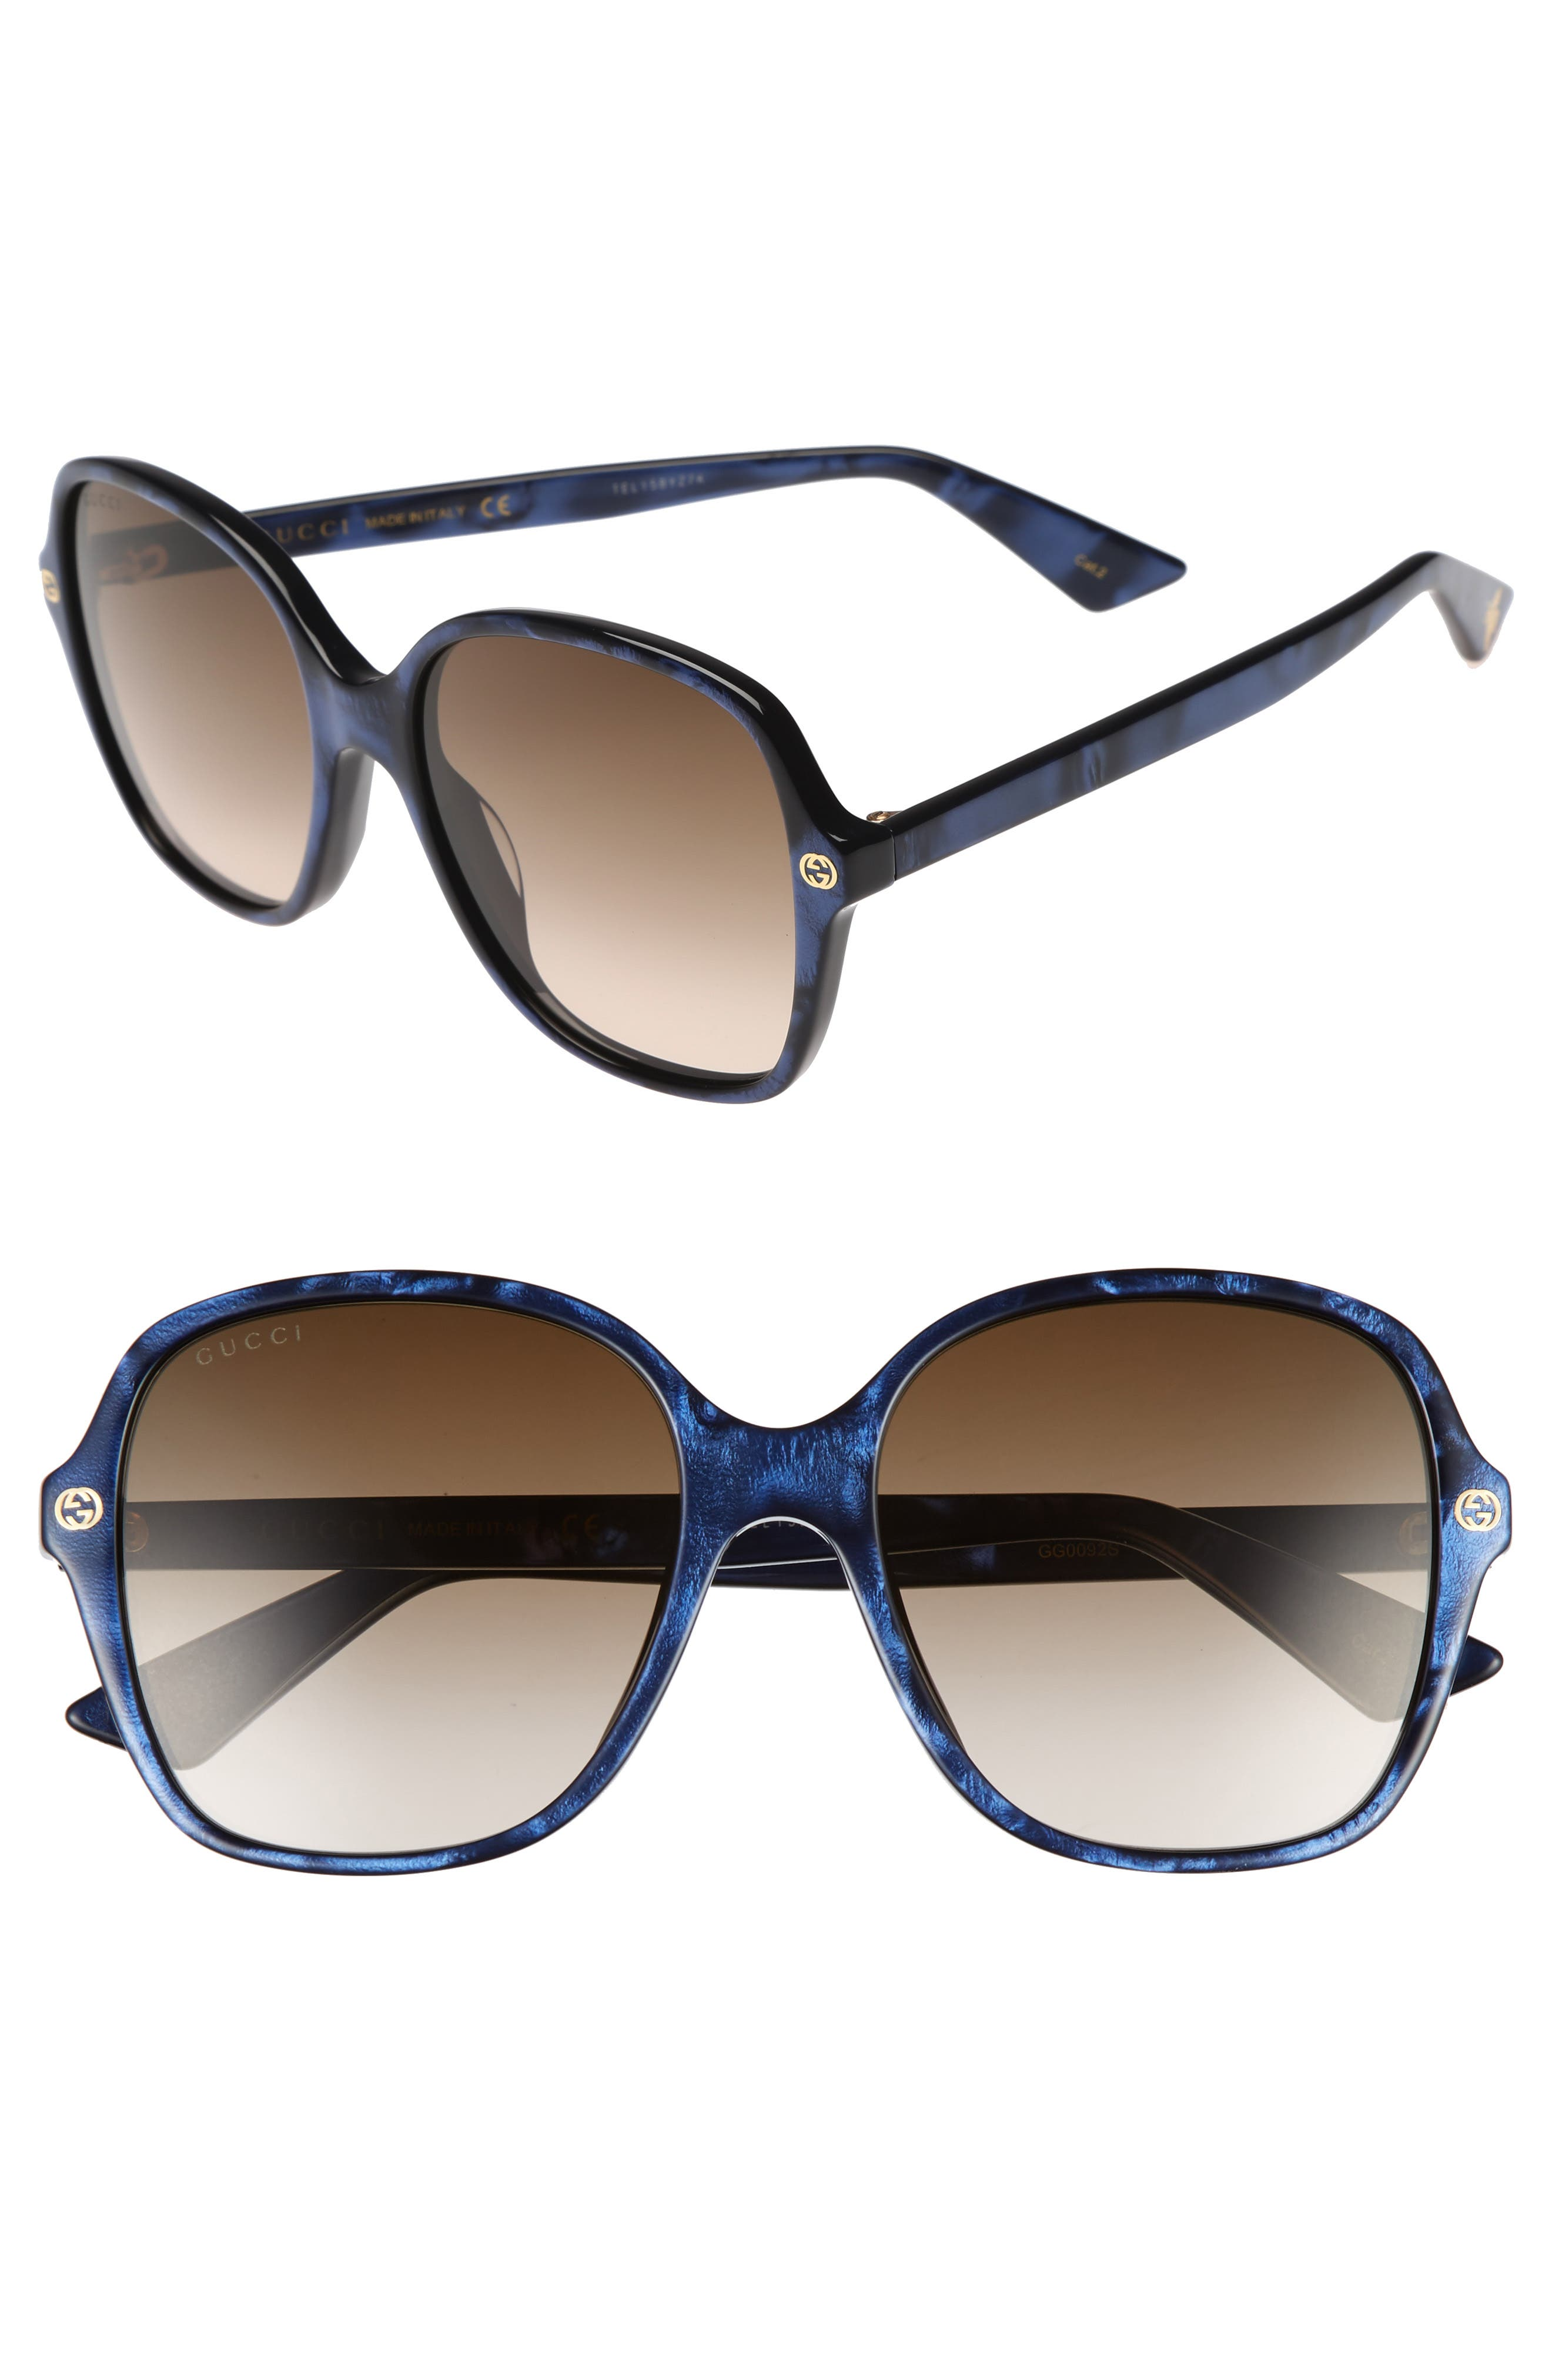 55mm Gradient Sunglasses,                             Main thumbnail 1, color,                             Blue/ Brown